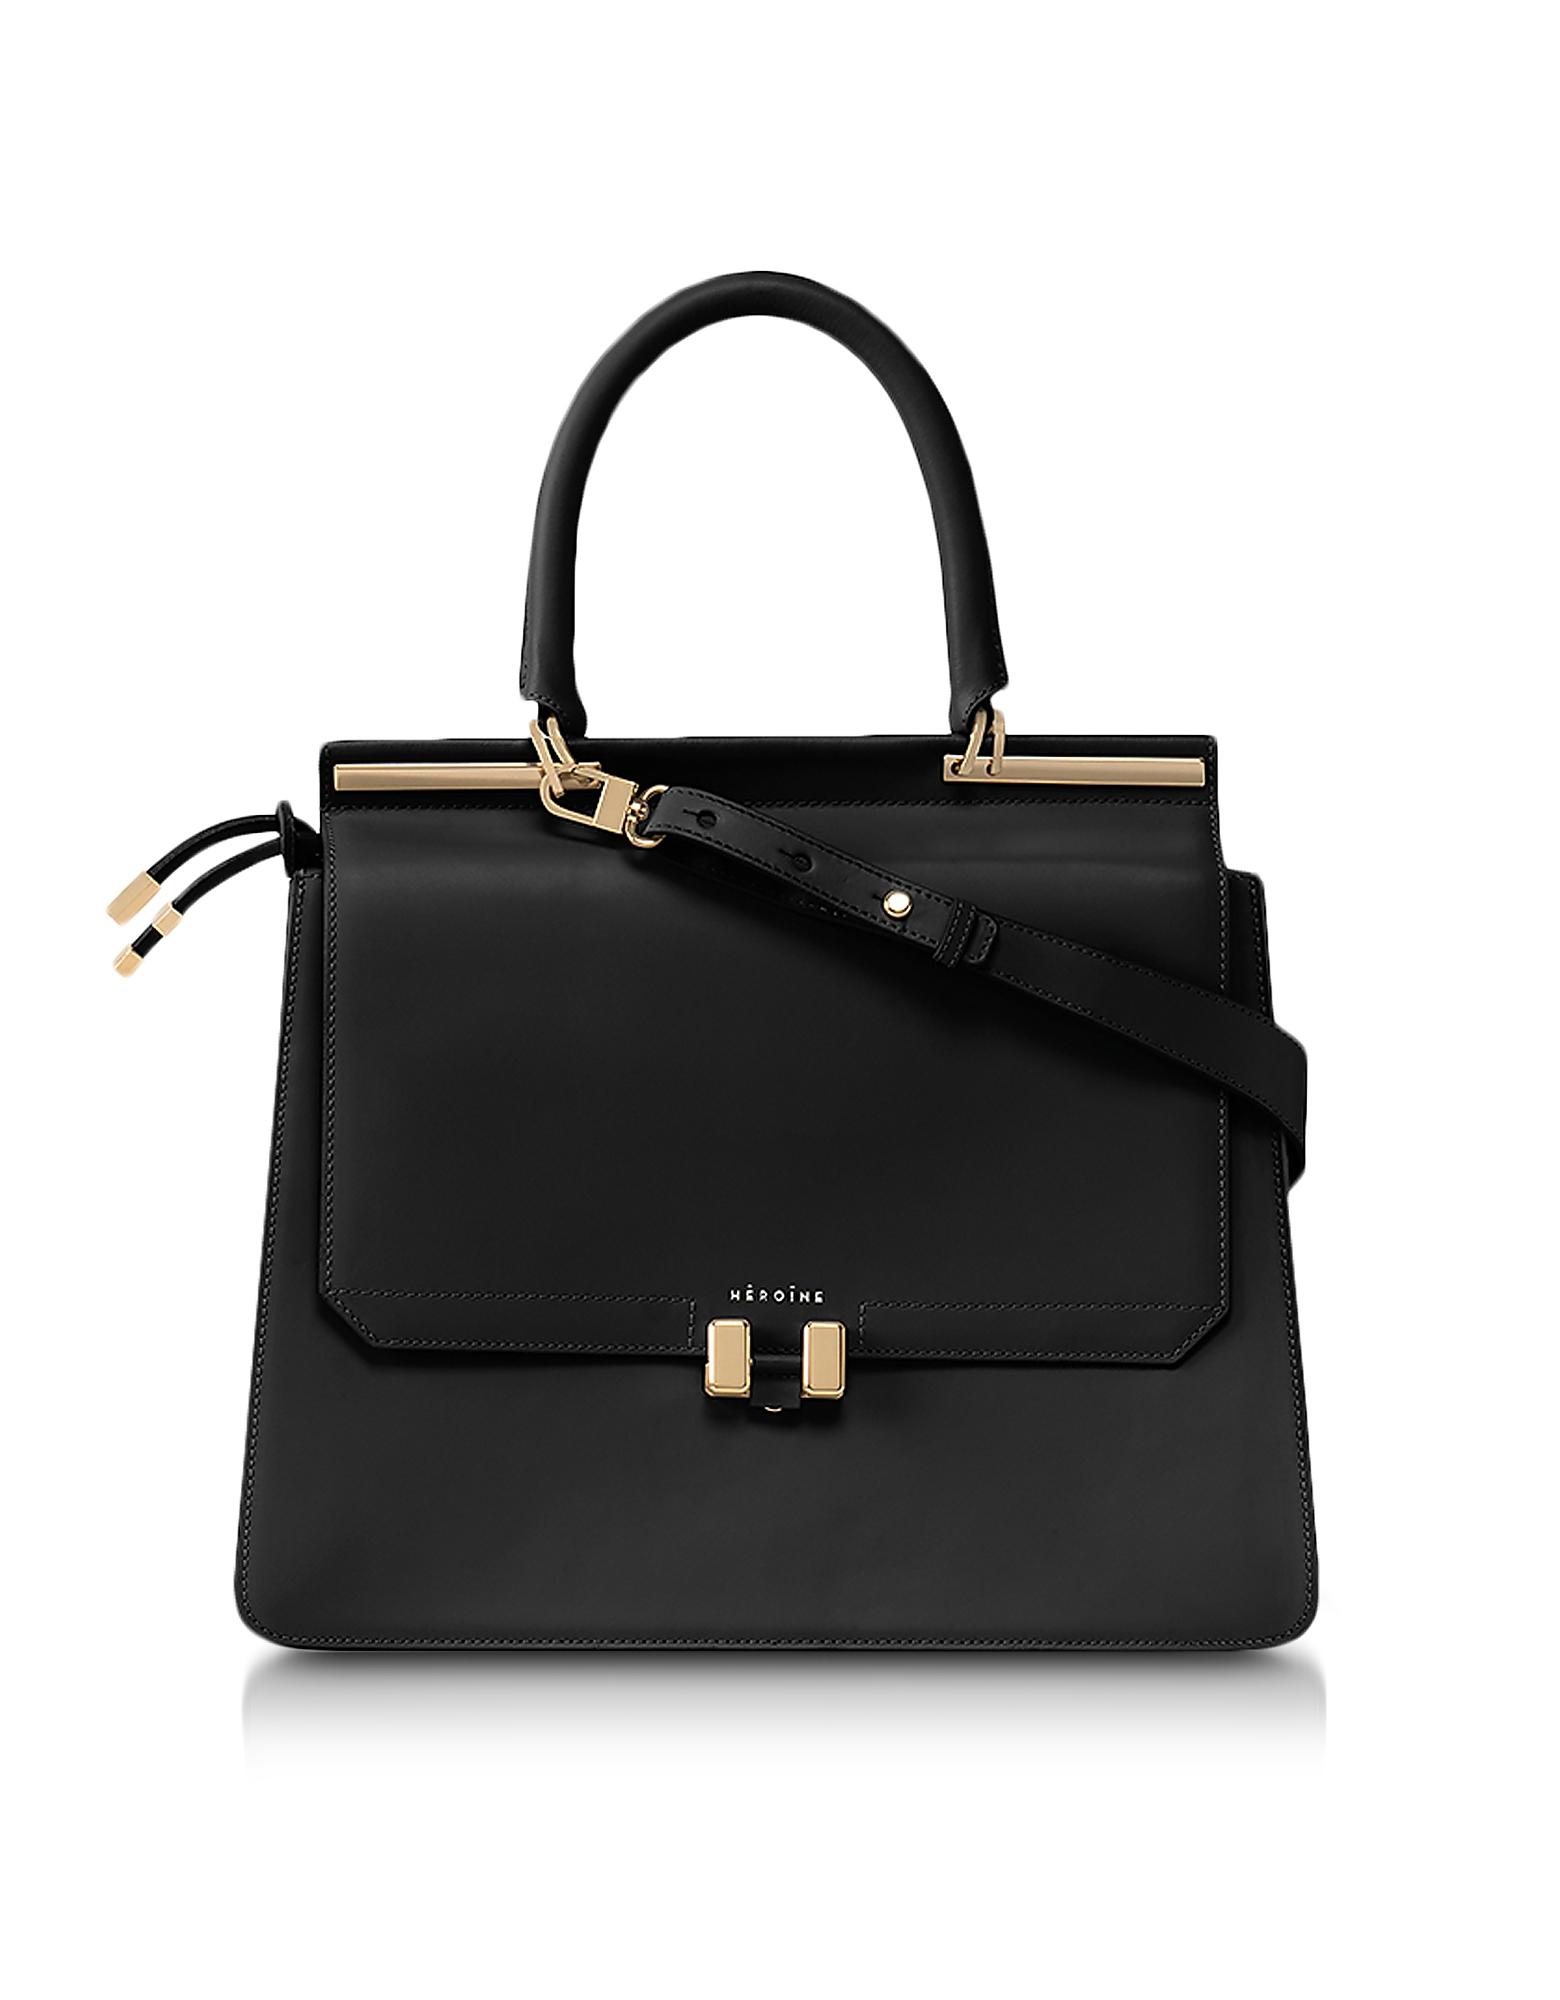 Maison Heroine Designer Handbags, Marlene Laptop Briefcase 13